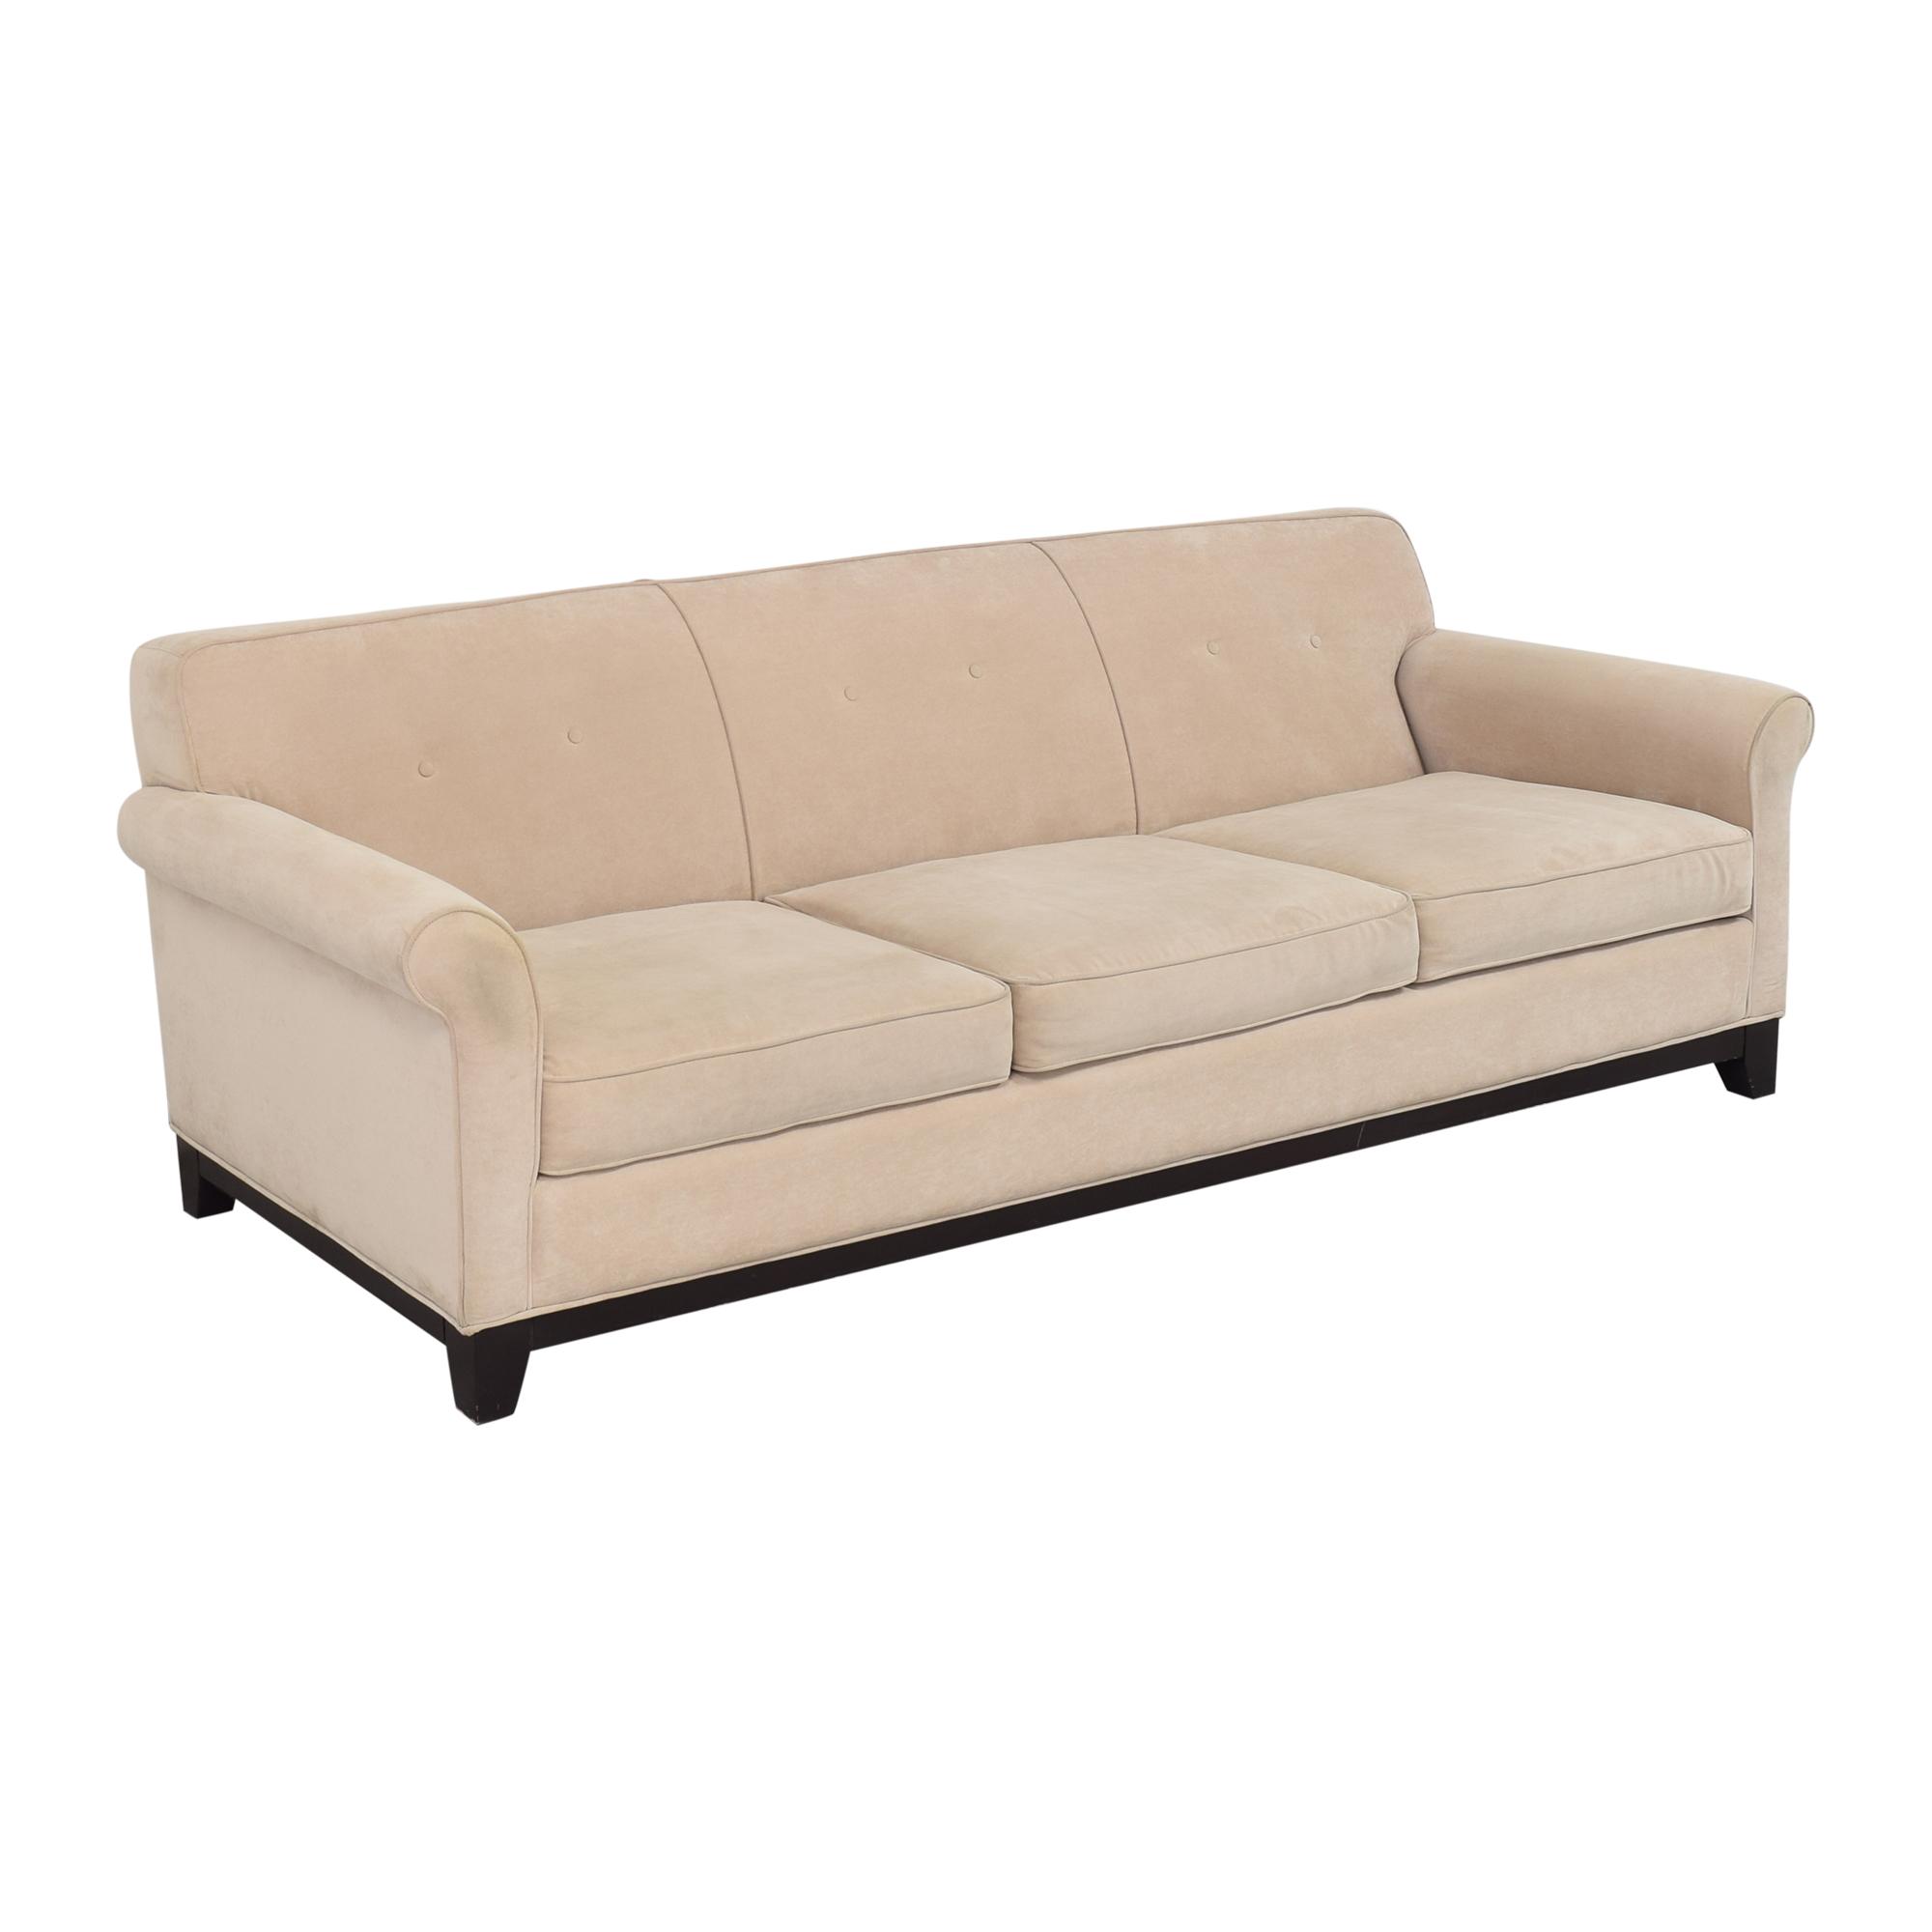 Three Cushion Roll Arm Sofa nj